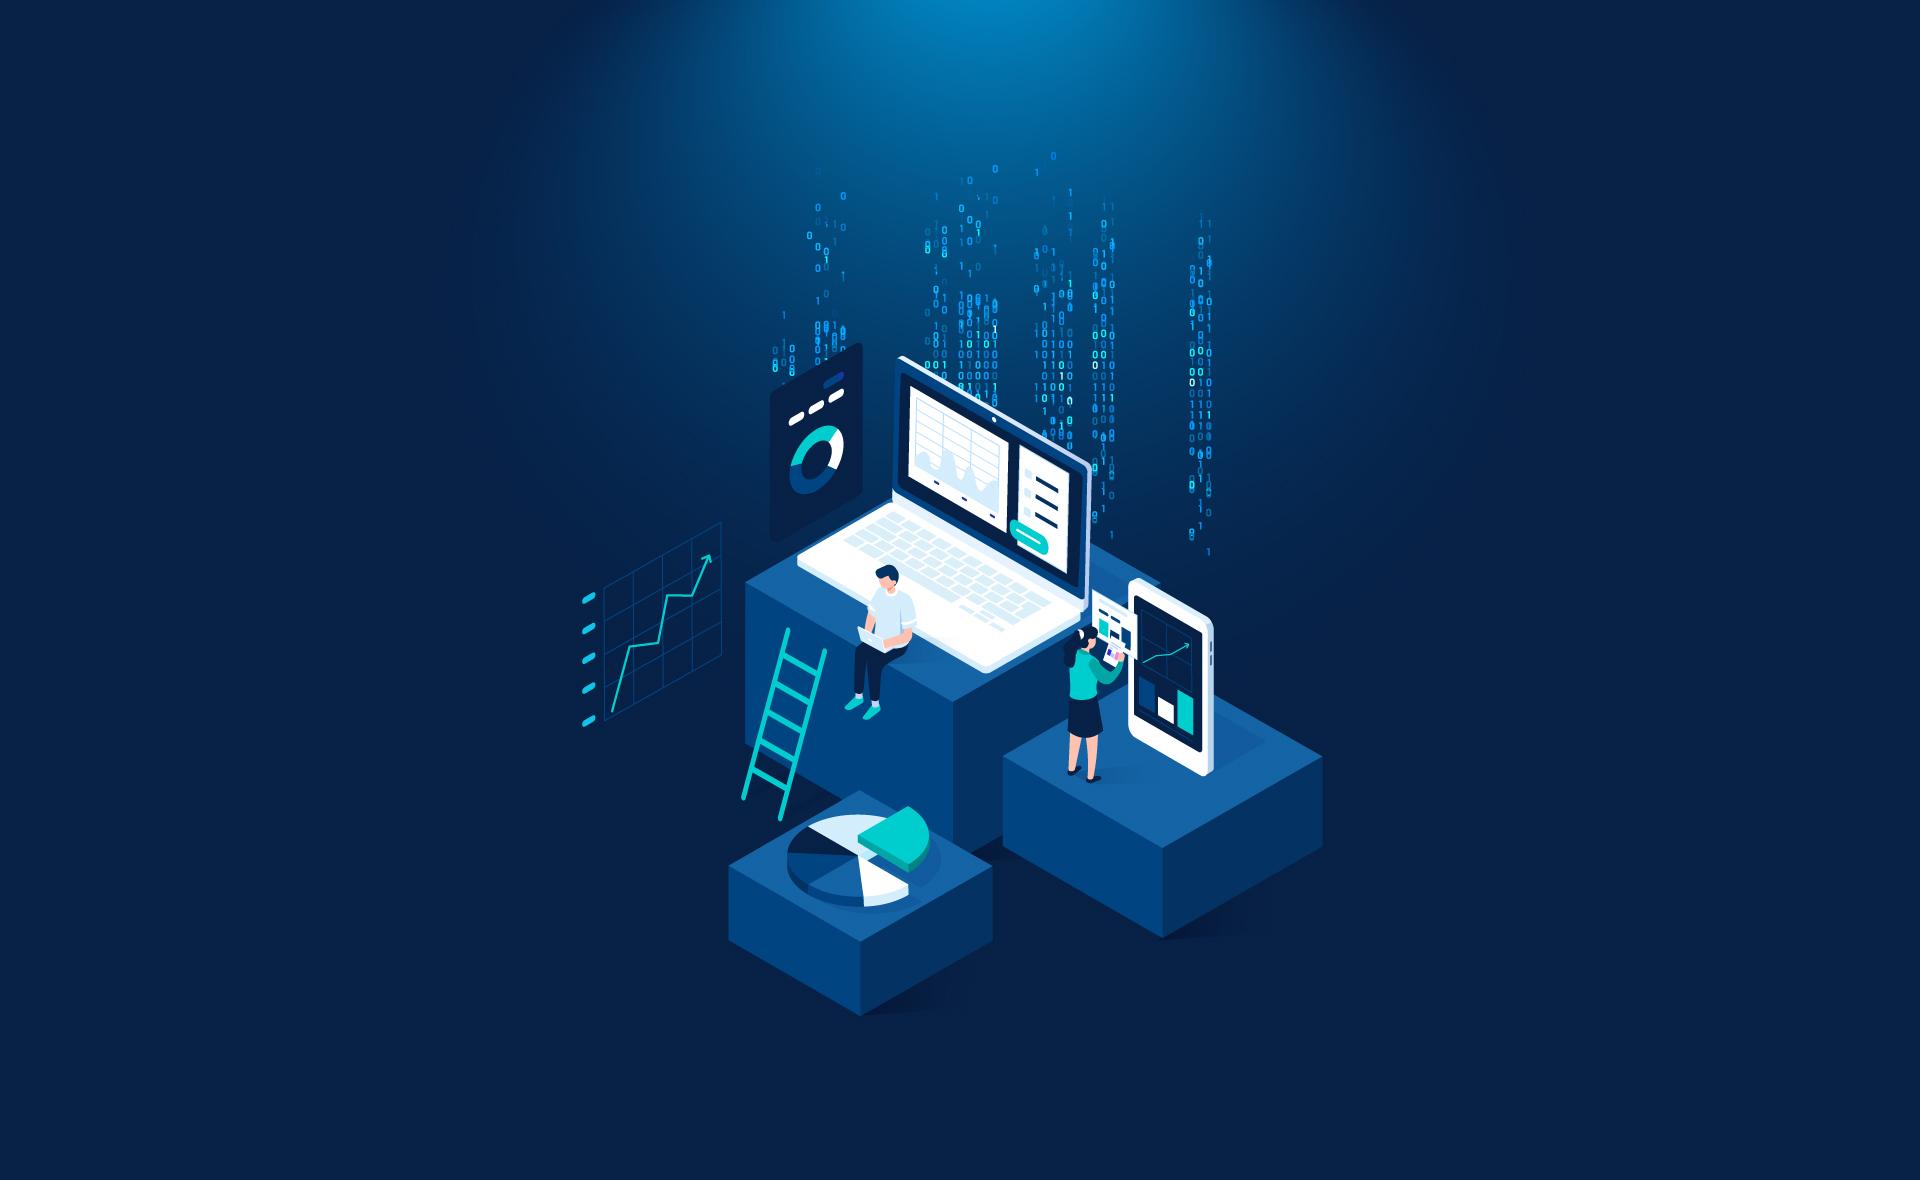 Fintech Startups in 2021: Is Pennylane Leading the Way?